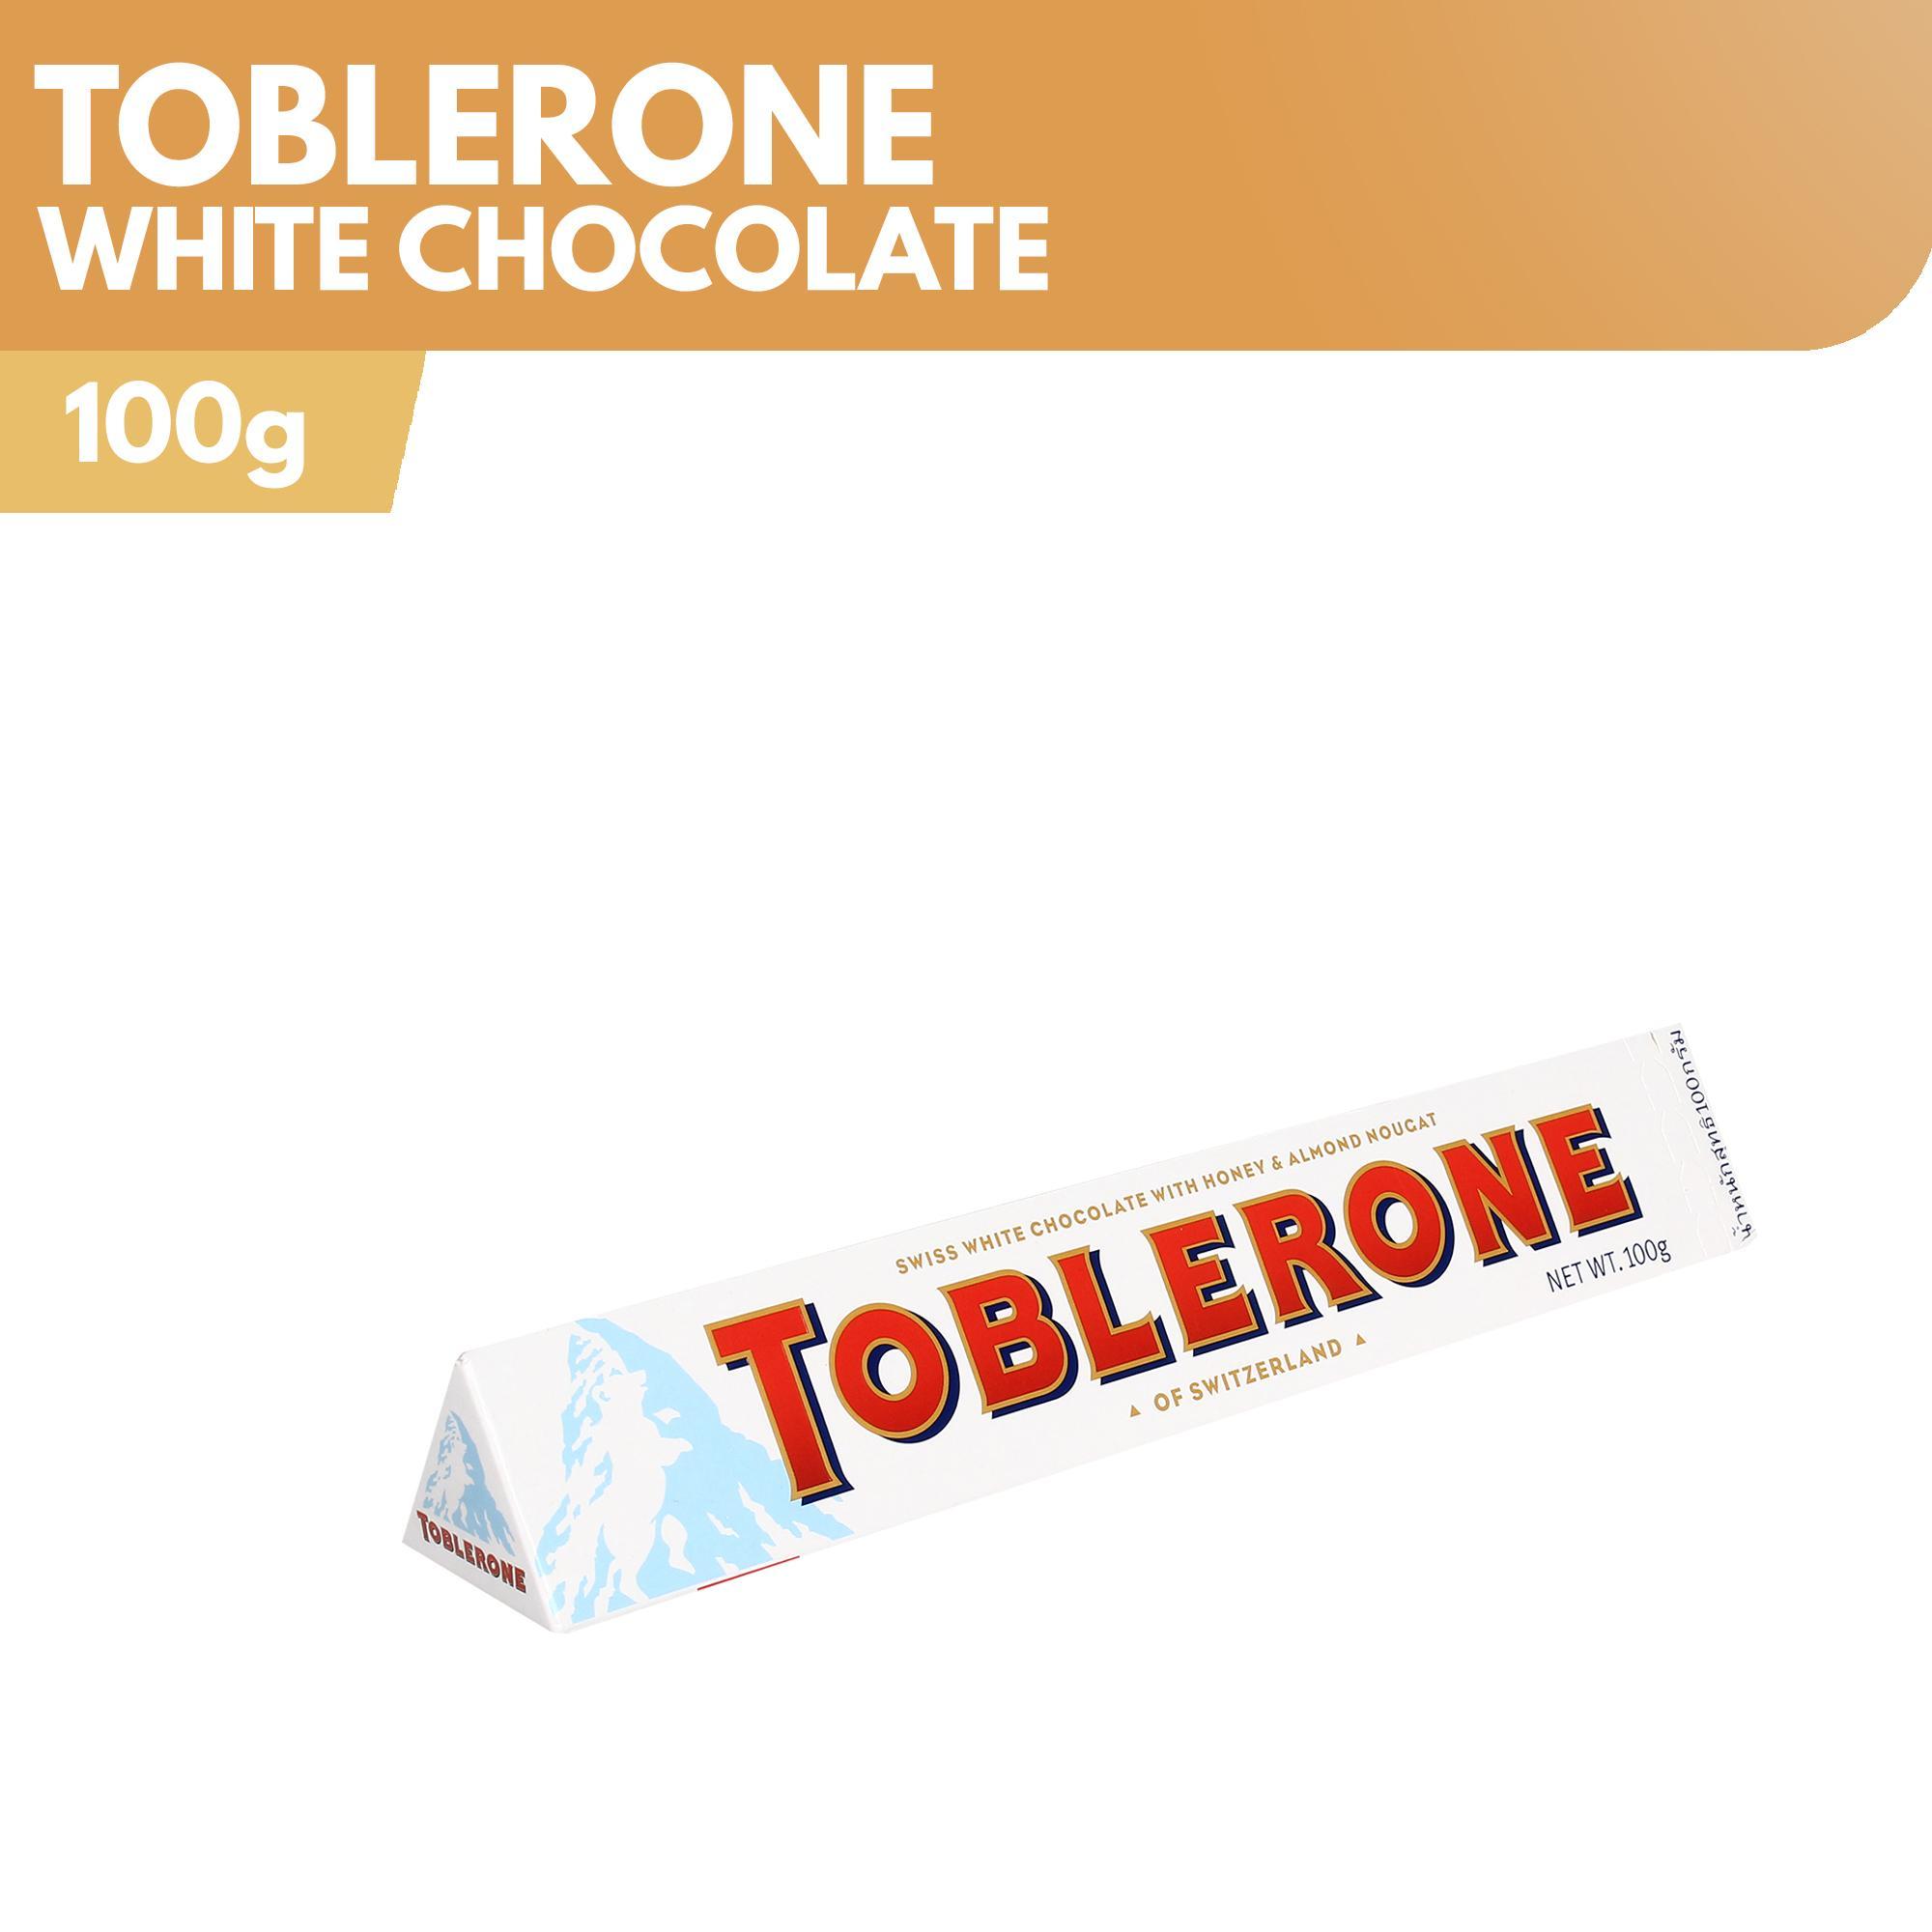 Toblerone White Chocolate 100g